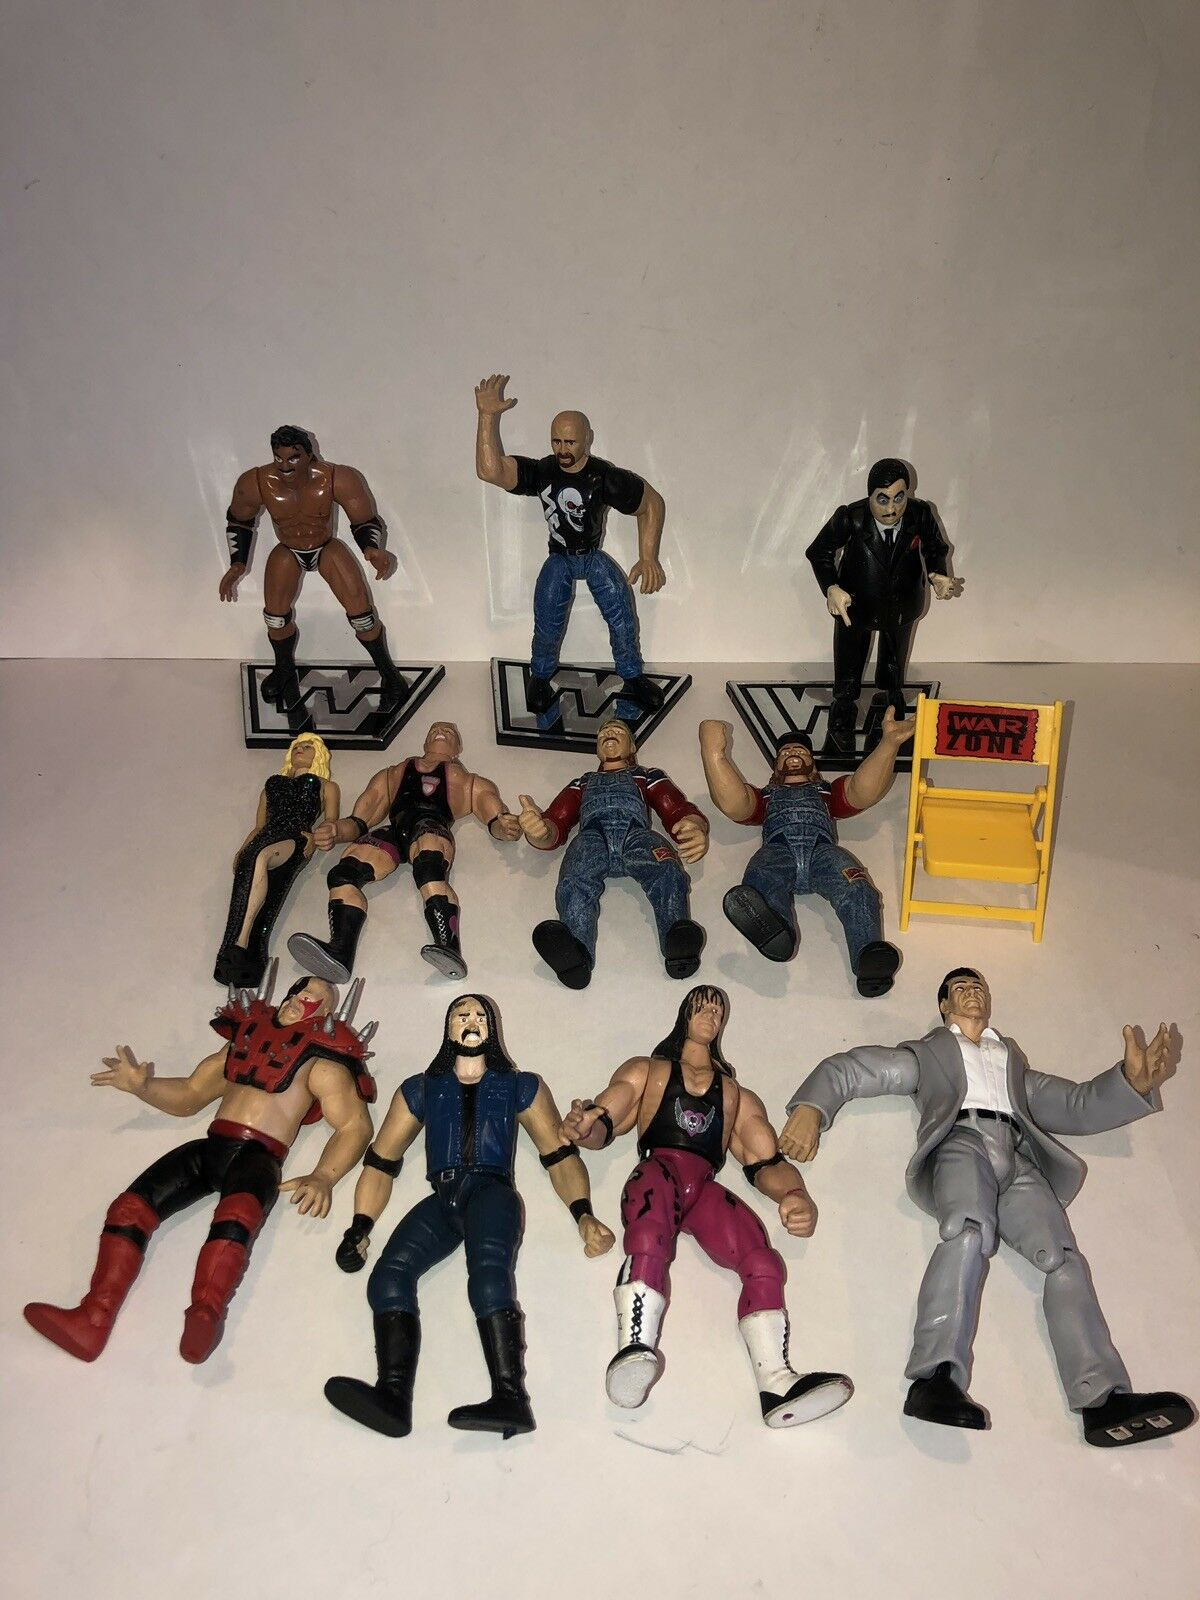 WWE WWF Wrestling Figures Lot of 11 96'-99' Pall Bearer Sable Crush Road Warrior